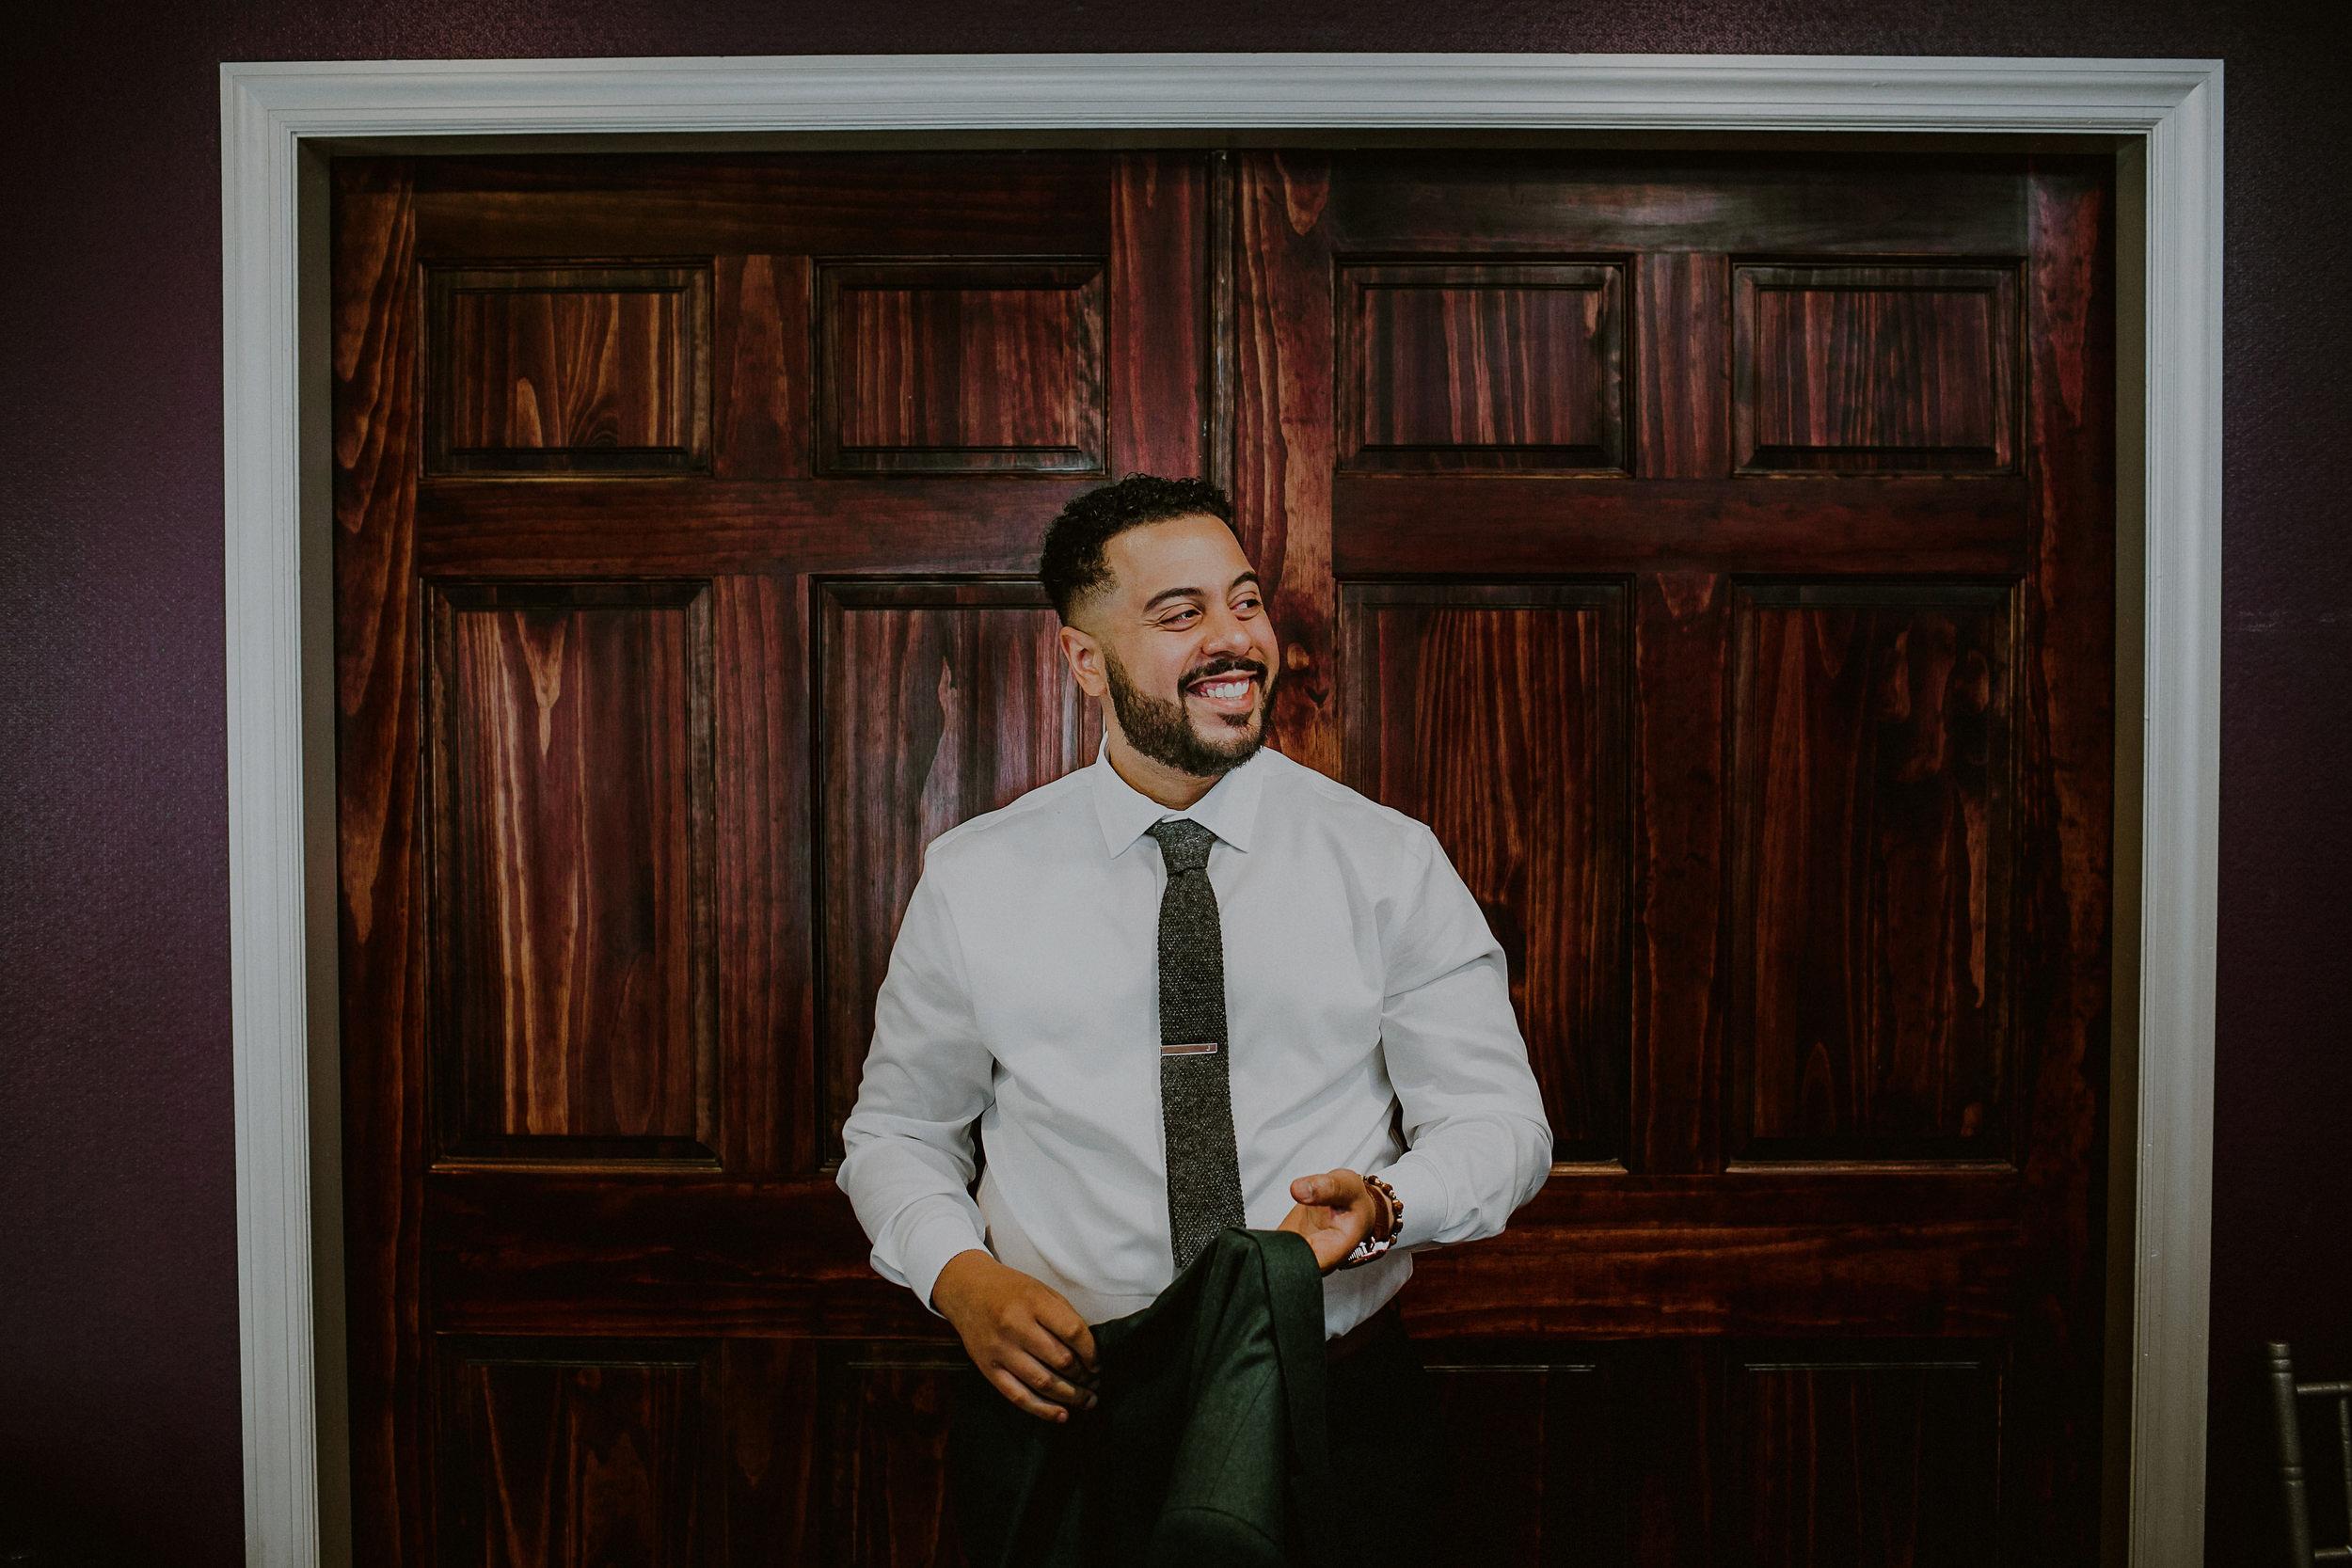 candid groom getting ready for wedding in woodbury ny